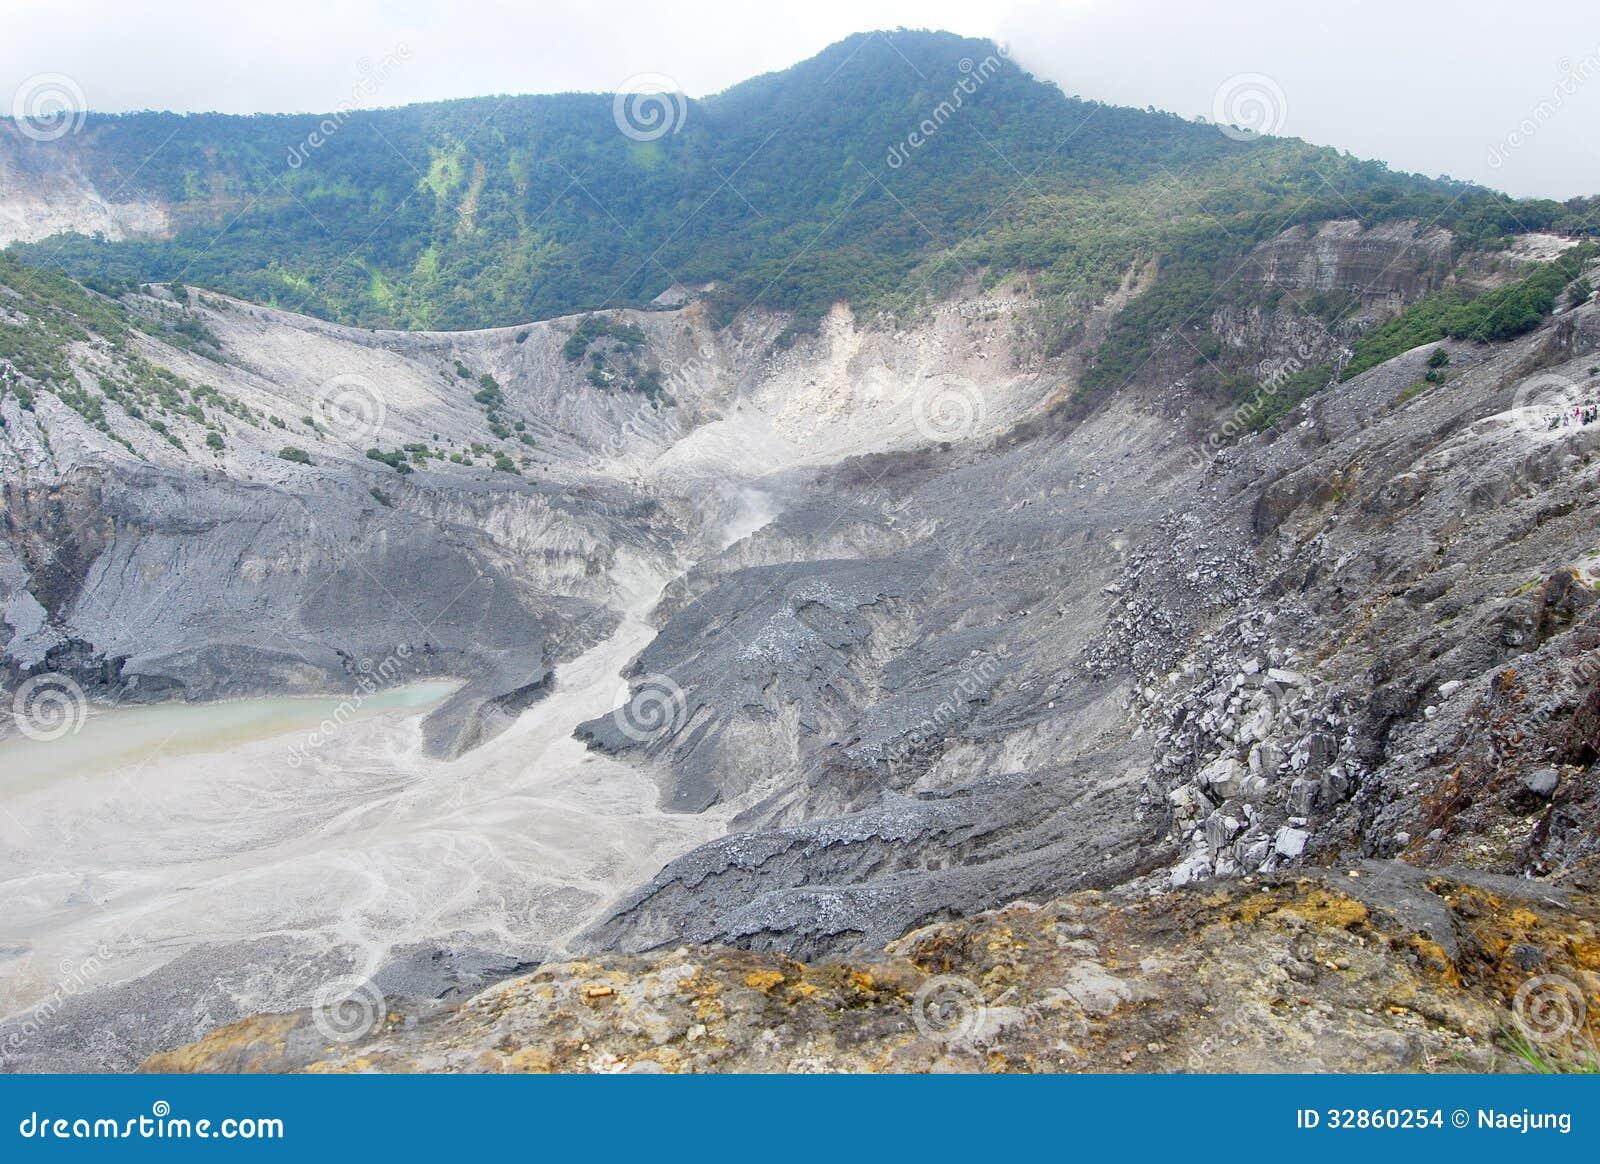 Volcán de Gunung Bartur